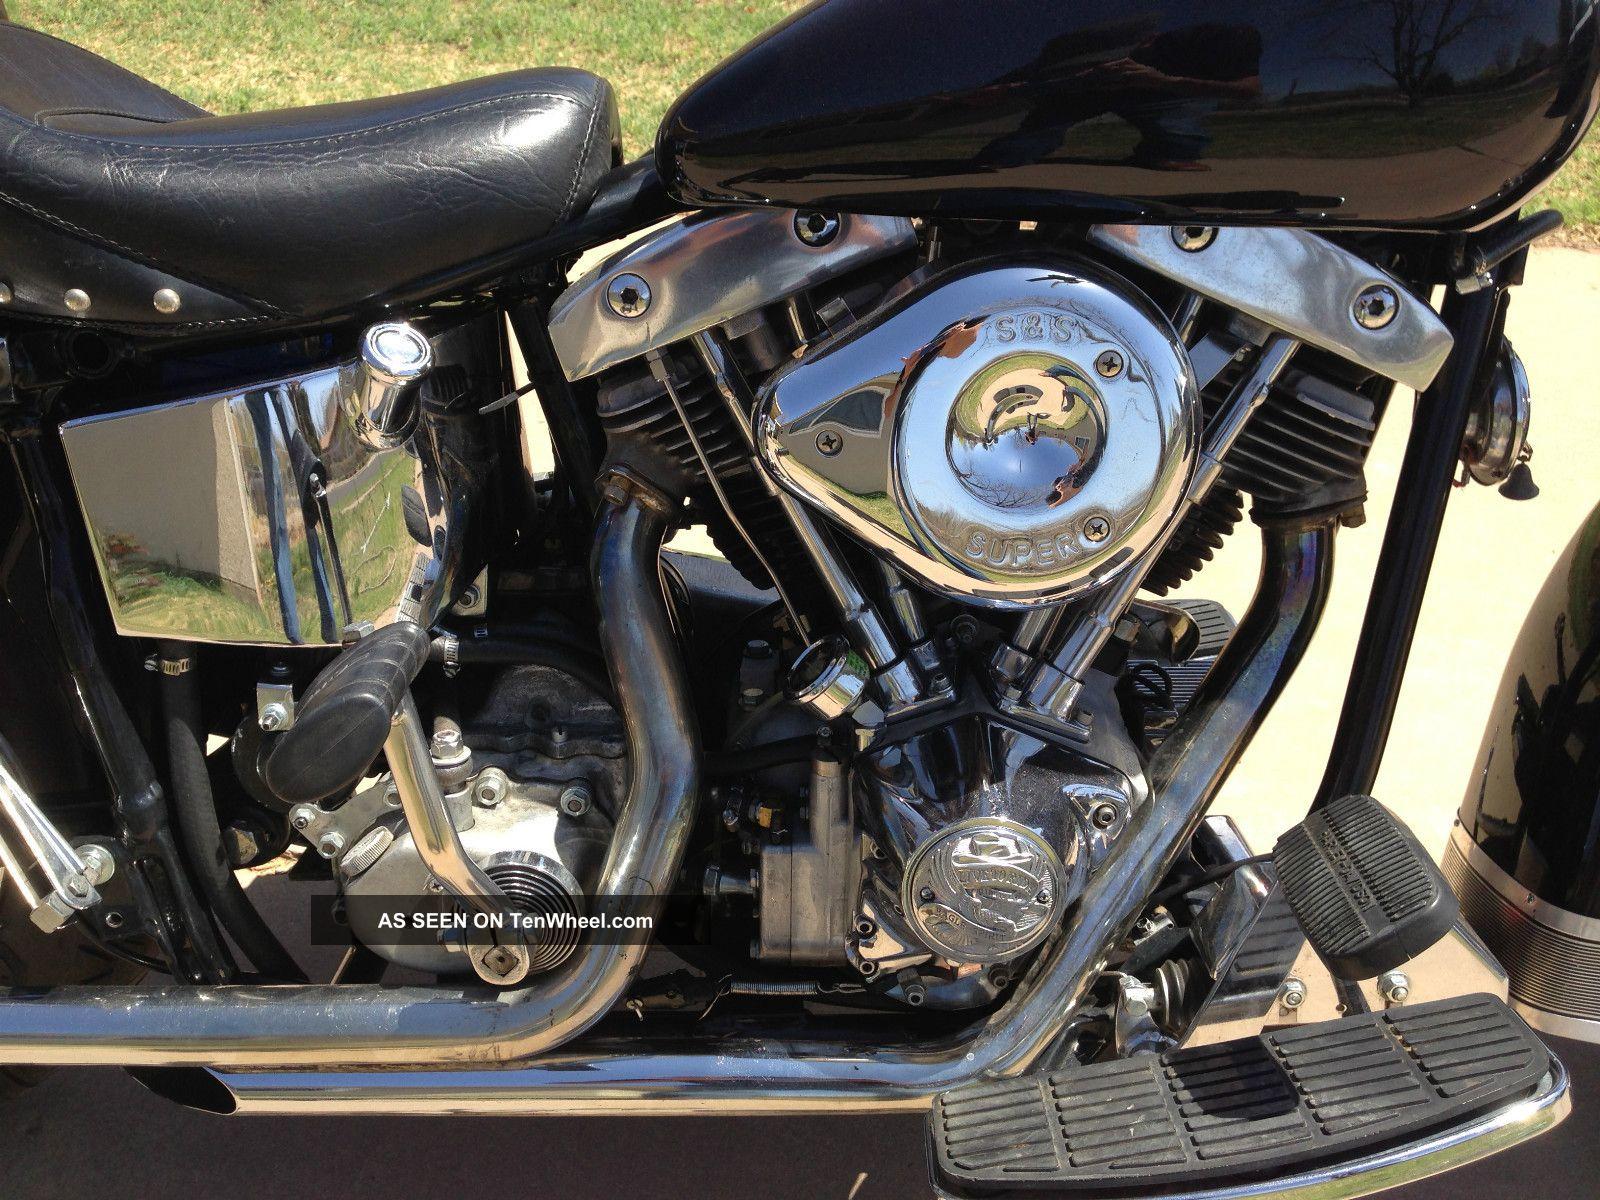 1980 Harley Davidson Flh Classic Shovel Head